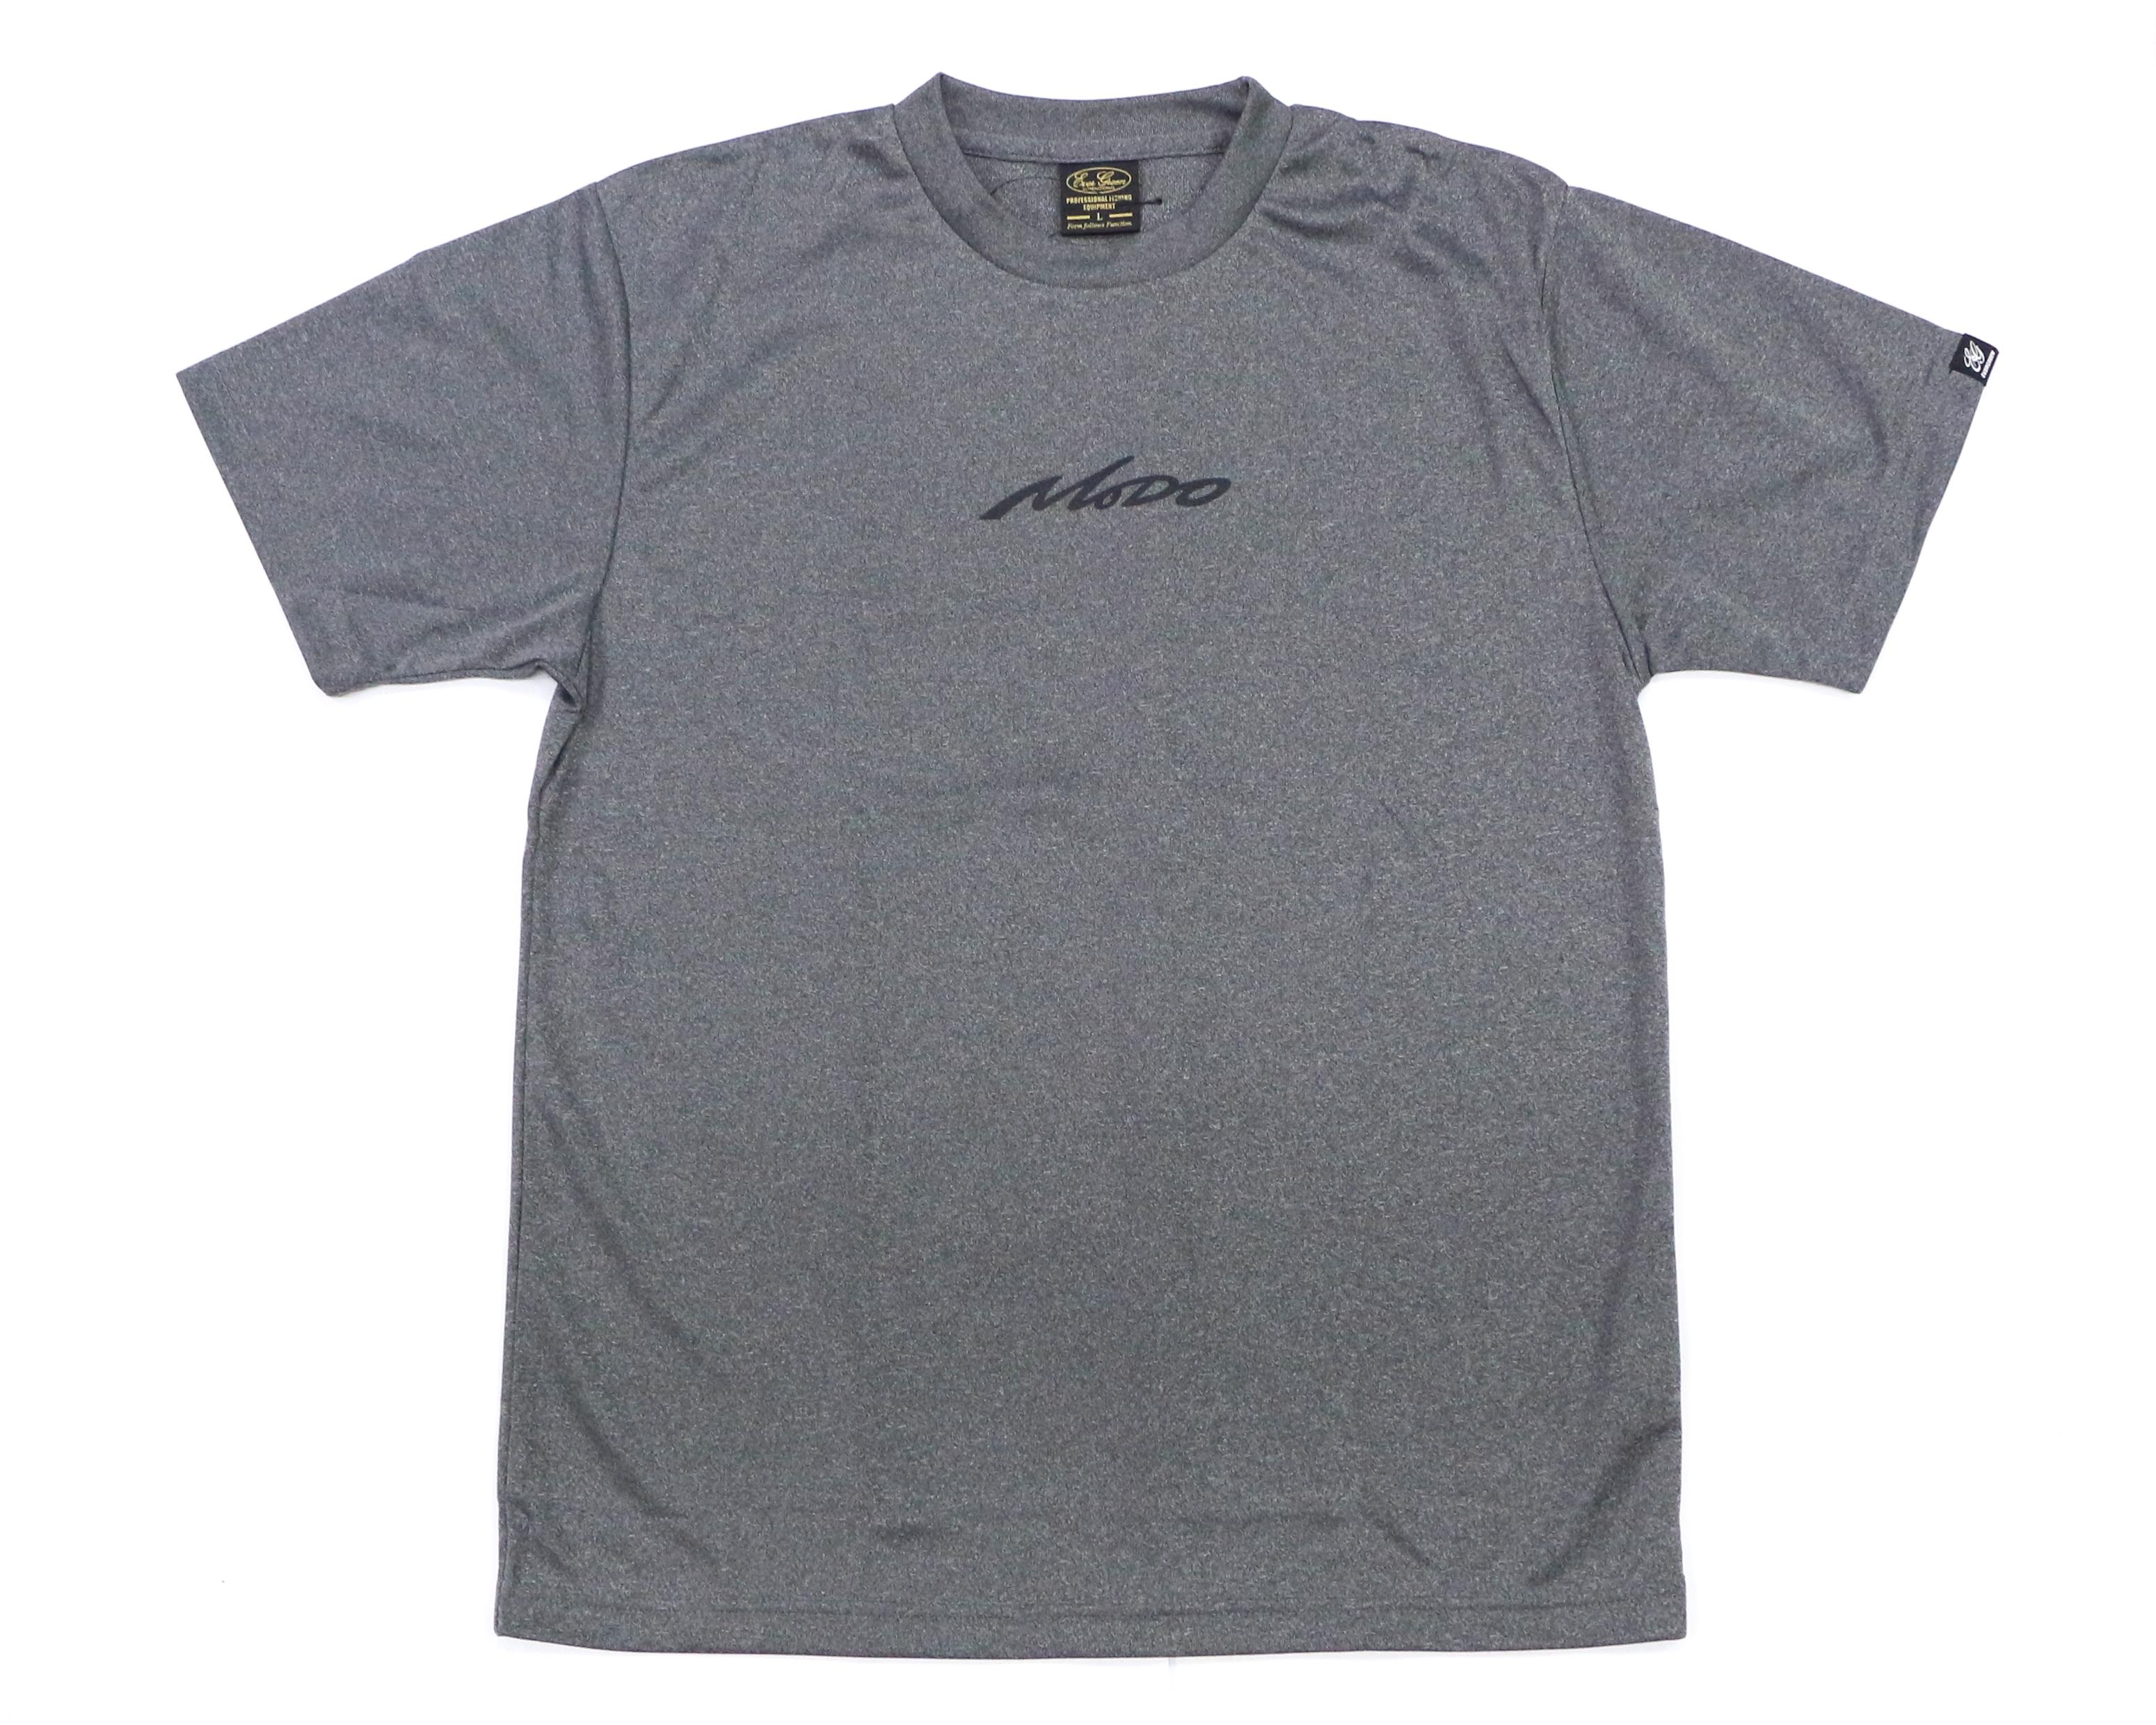 Sale Evergreen T-Shirt Dry Fit Short Sleeve Mode E Type Size XXL Gray (5196)